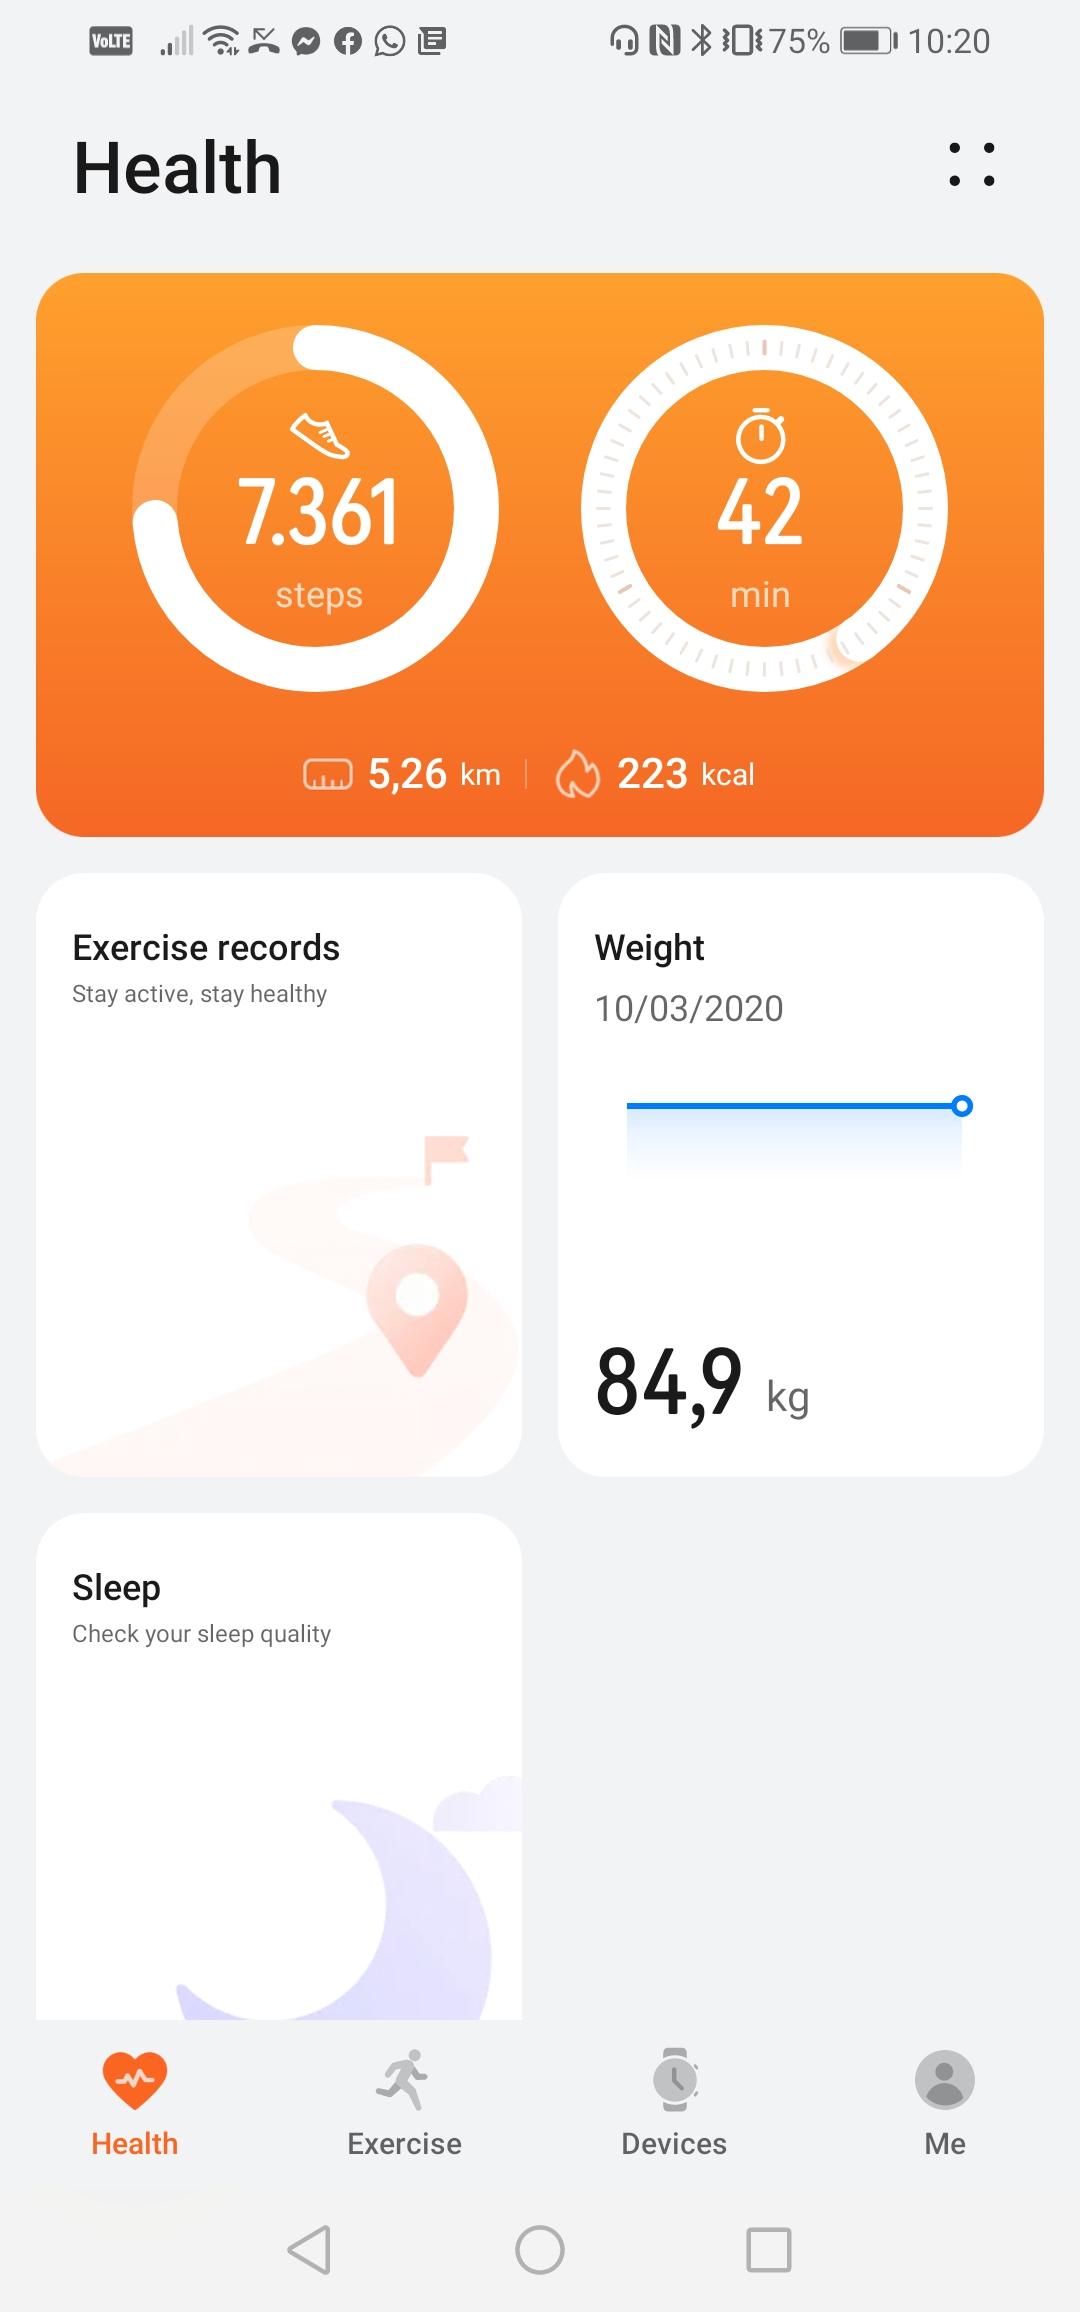 screenshot_20210510_102002_com-huawei-health_0